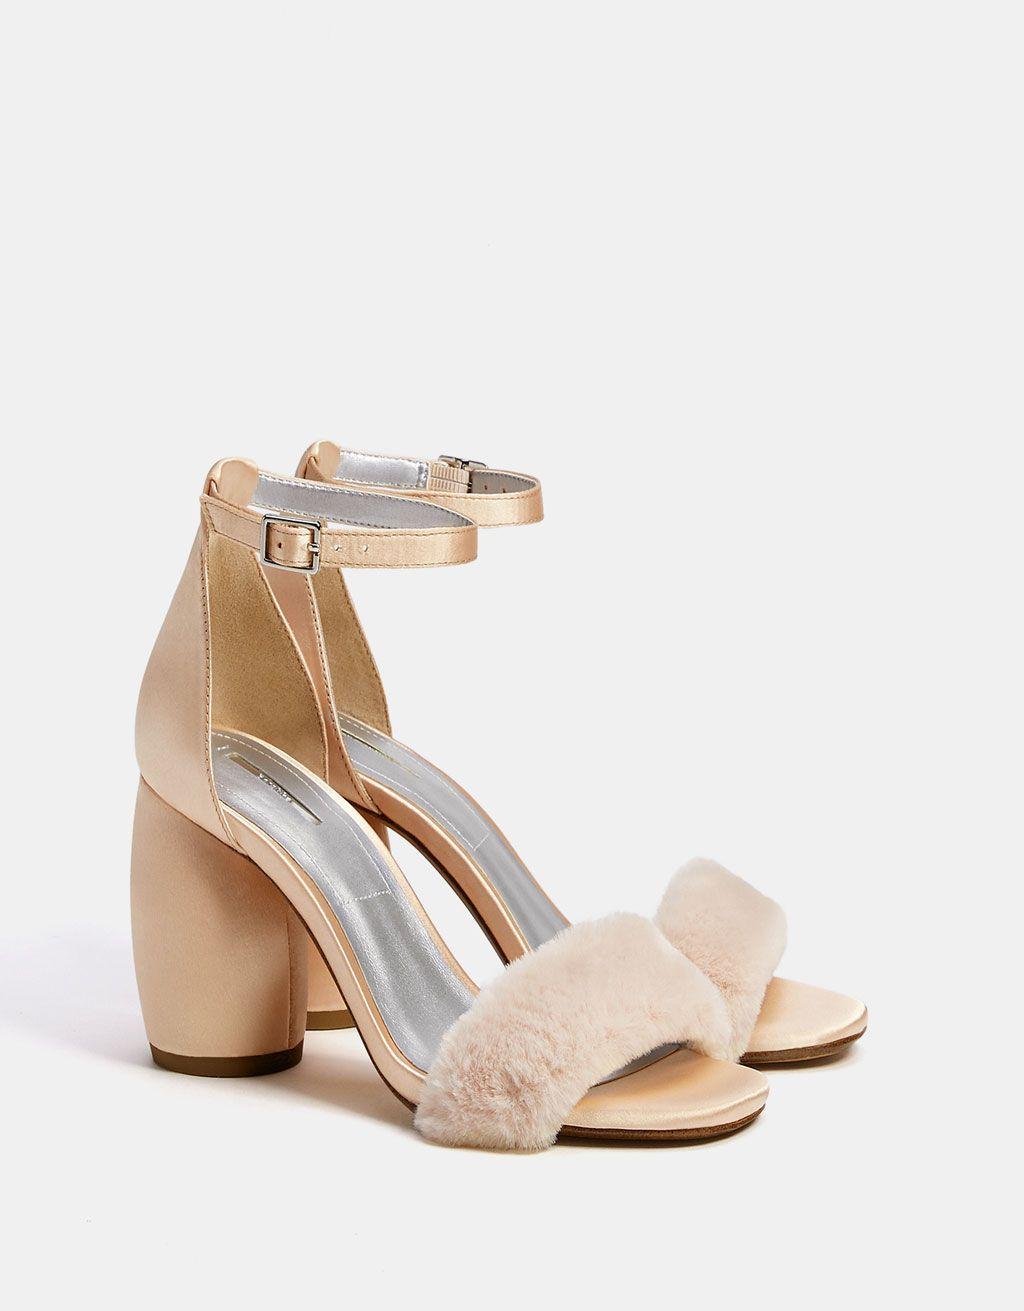 Zapatos Raso Con Bohemia Sandalia PeloModa Pinterest Tacón OXuZPki